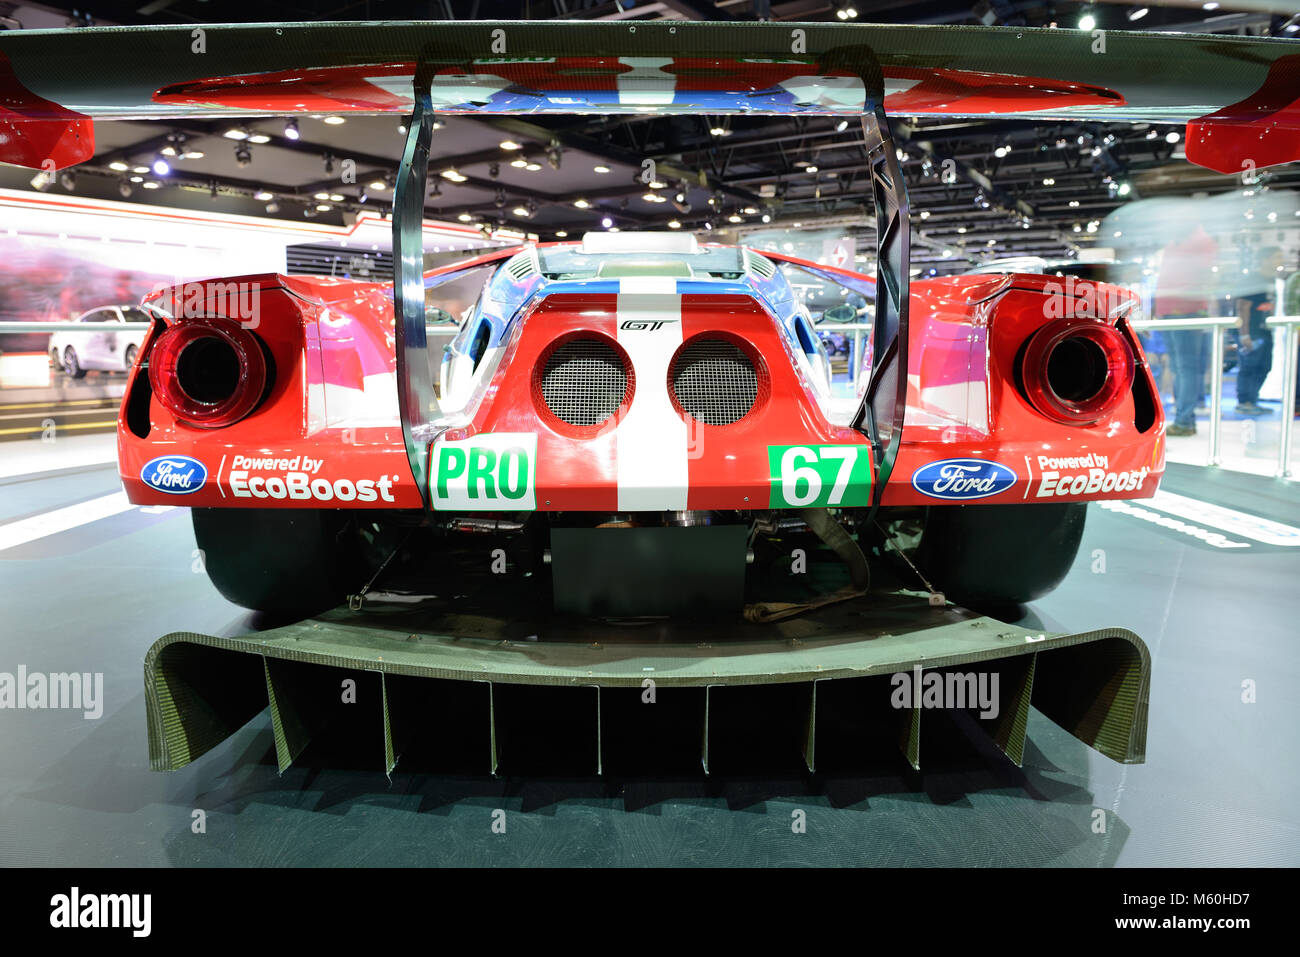 Dubai Uae November  The Ford Gt Race Car Is On Dubai Motor Show  On November